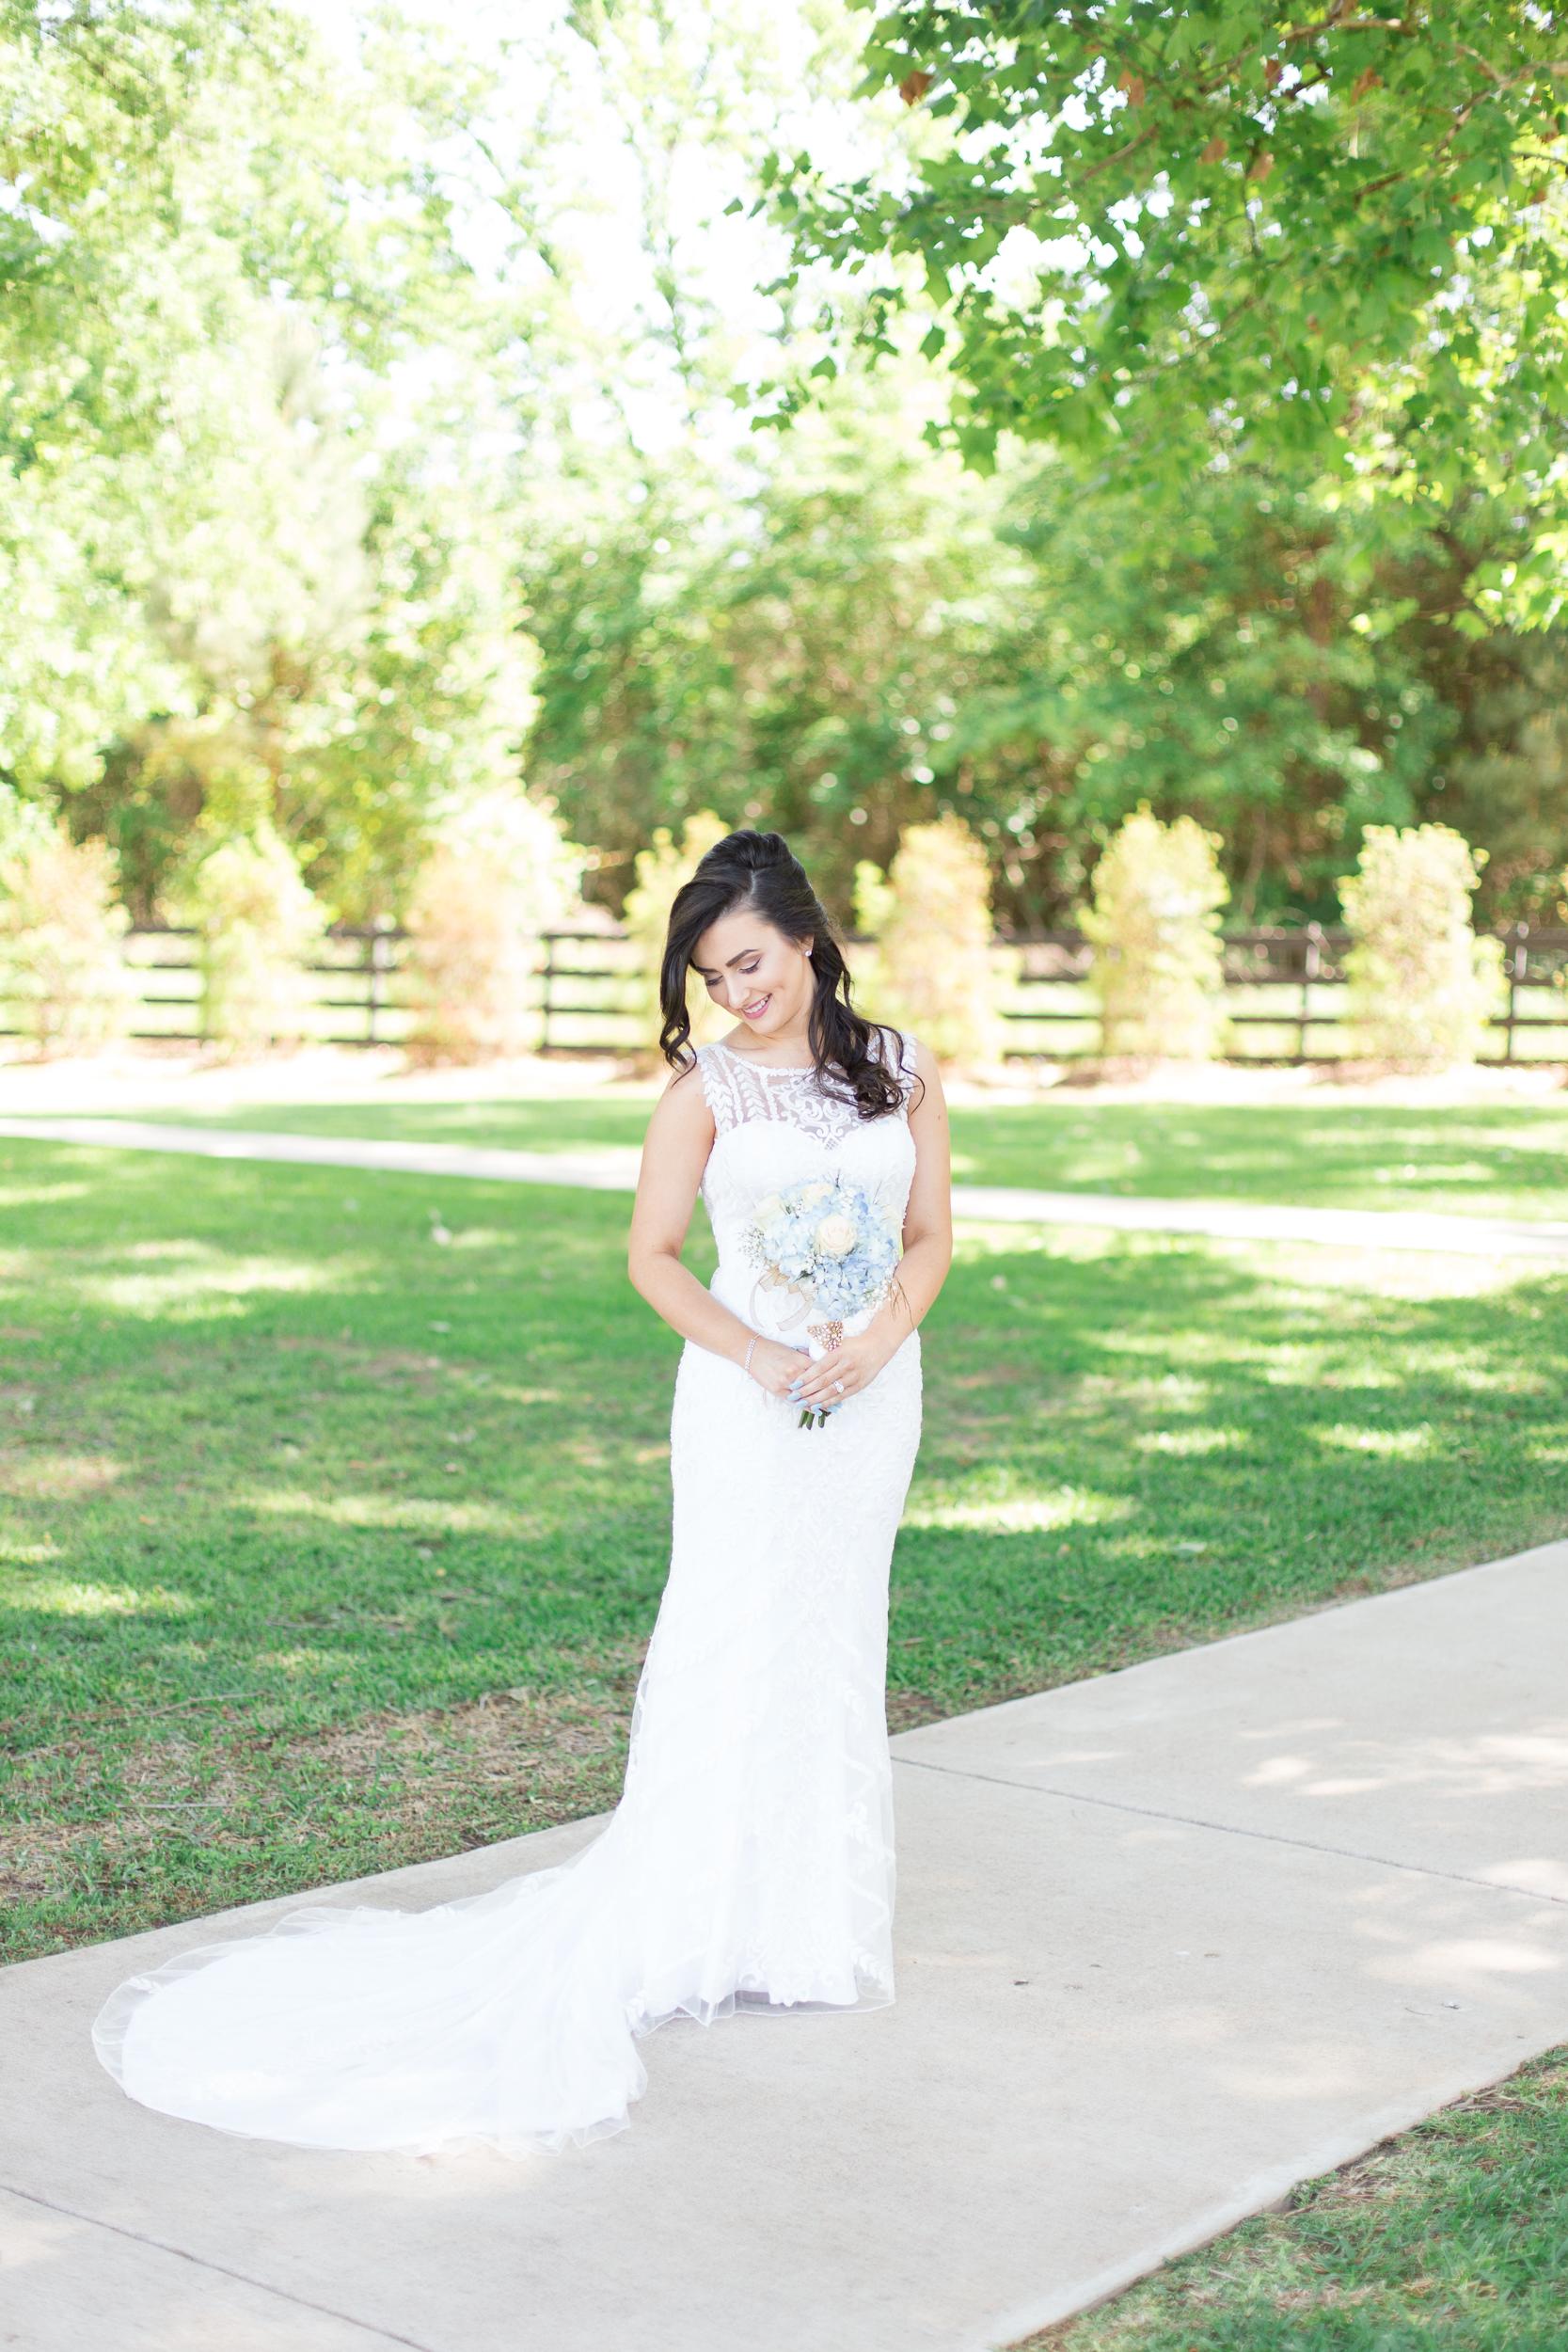 Zihlman-East TX Wedding_Kelsie Hendricks Photography_The Folmar Tyler Texas-72.jpg